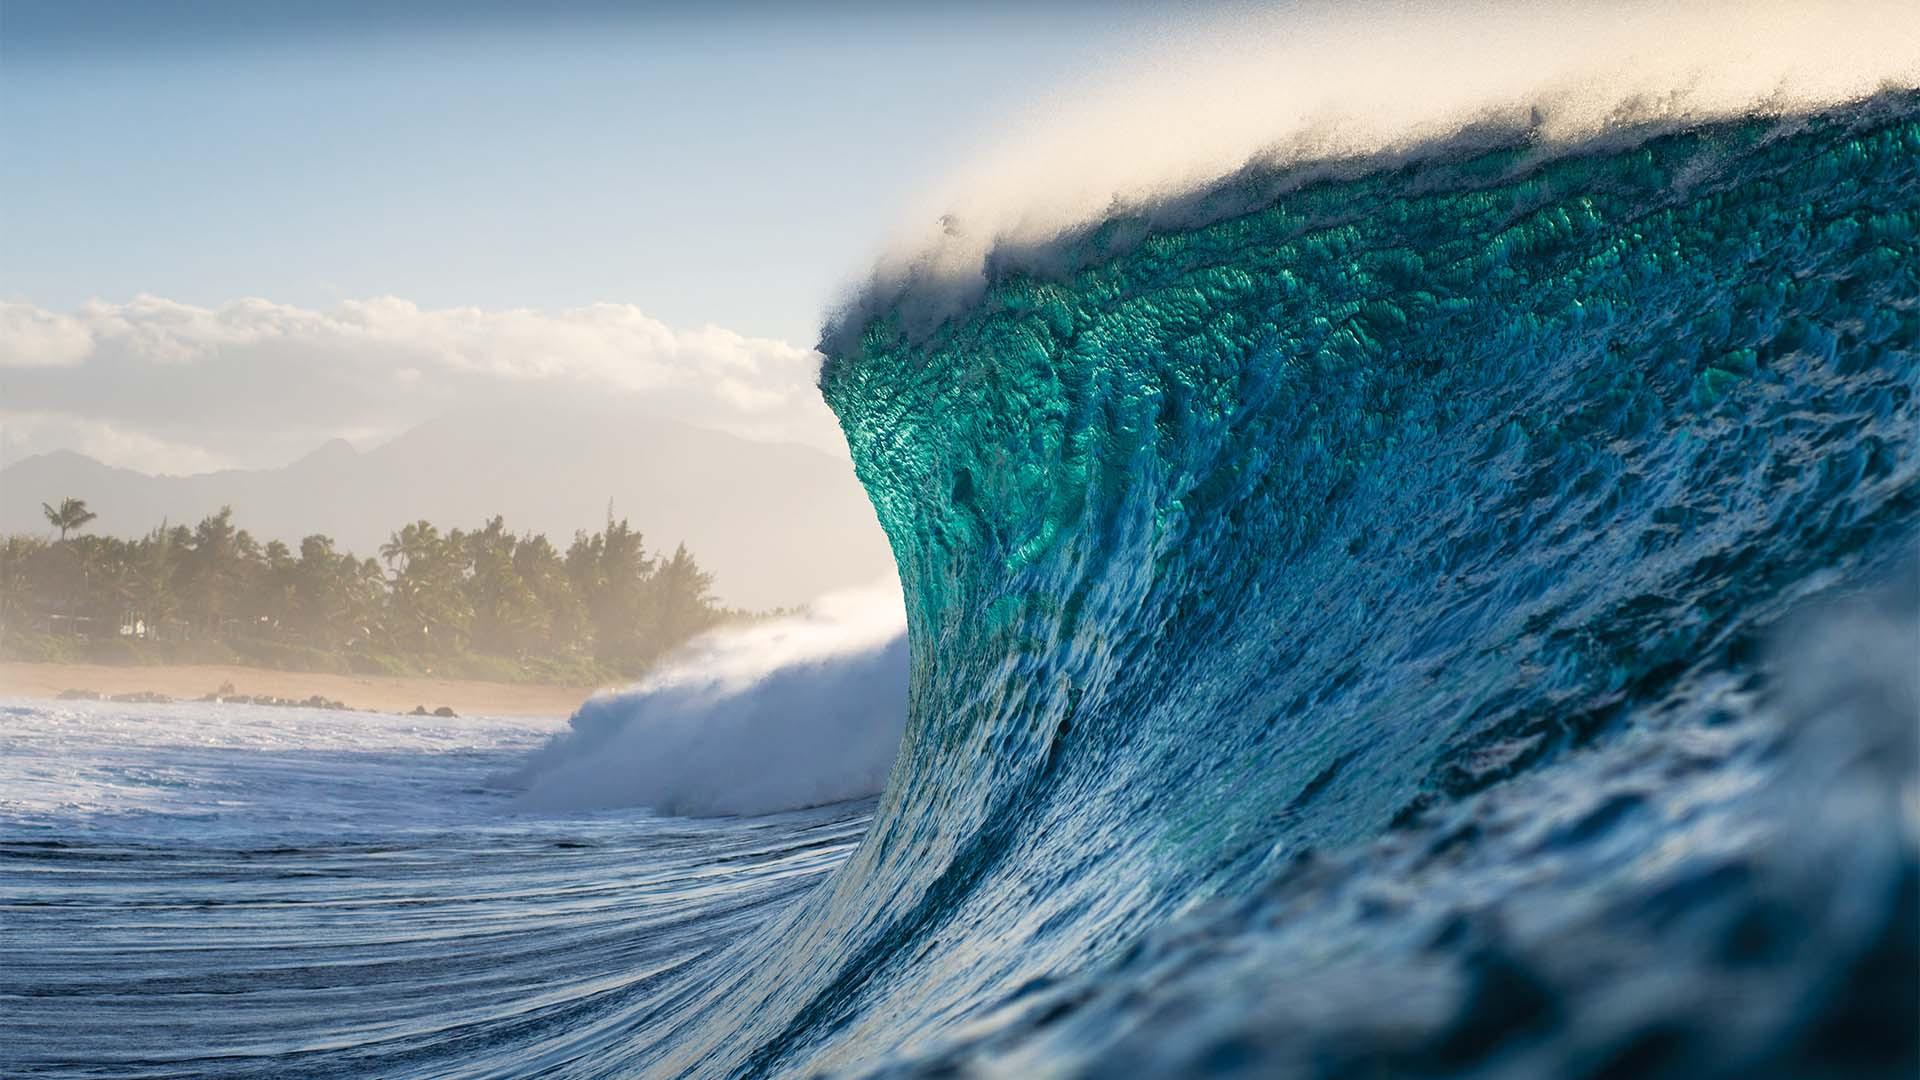 Famous surf break, Banzai Pipeline in Hawaii, USA